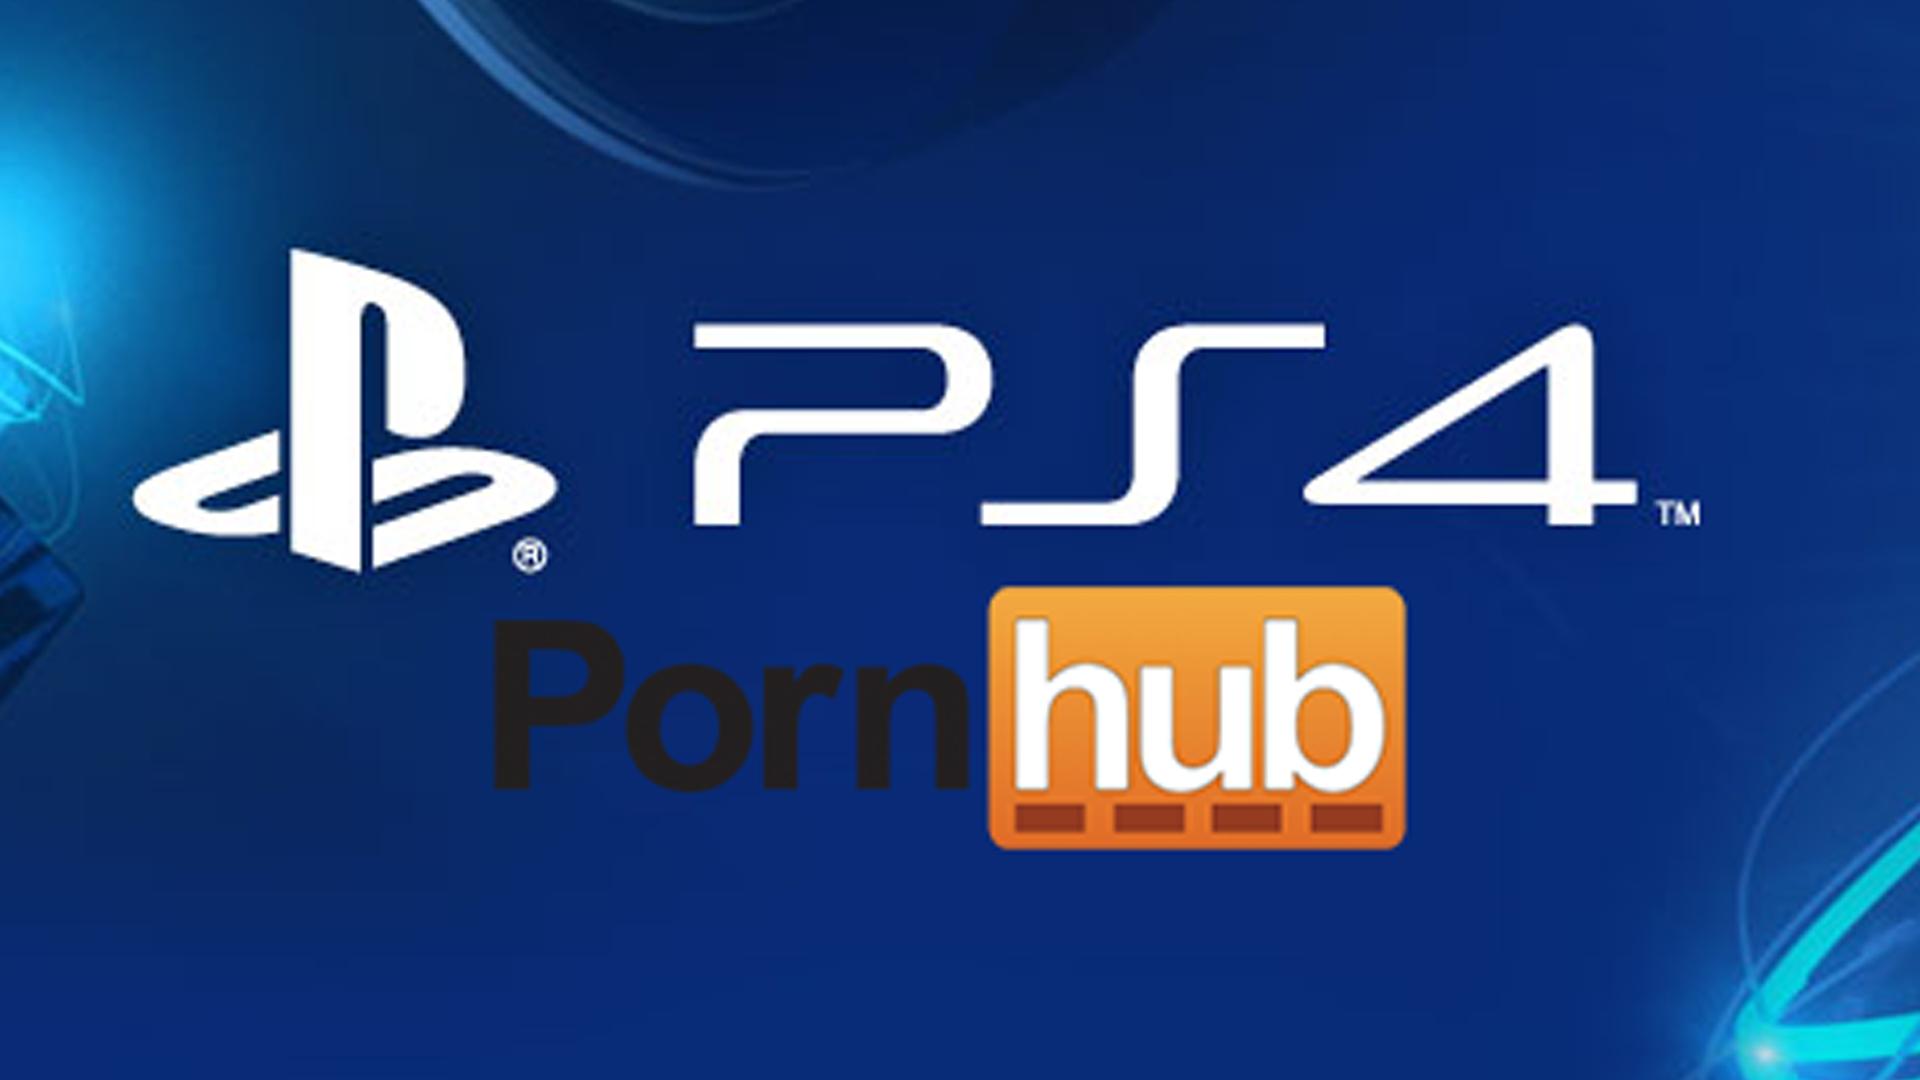 Forum mot de passe porn top